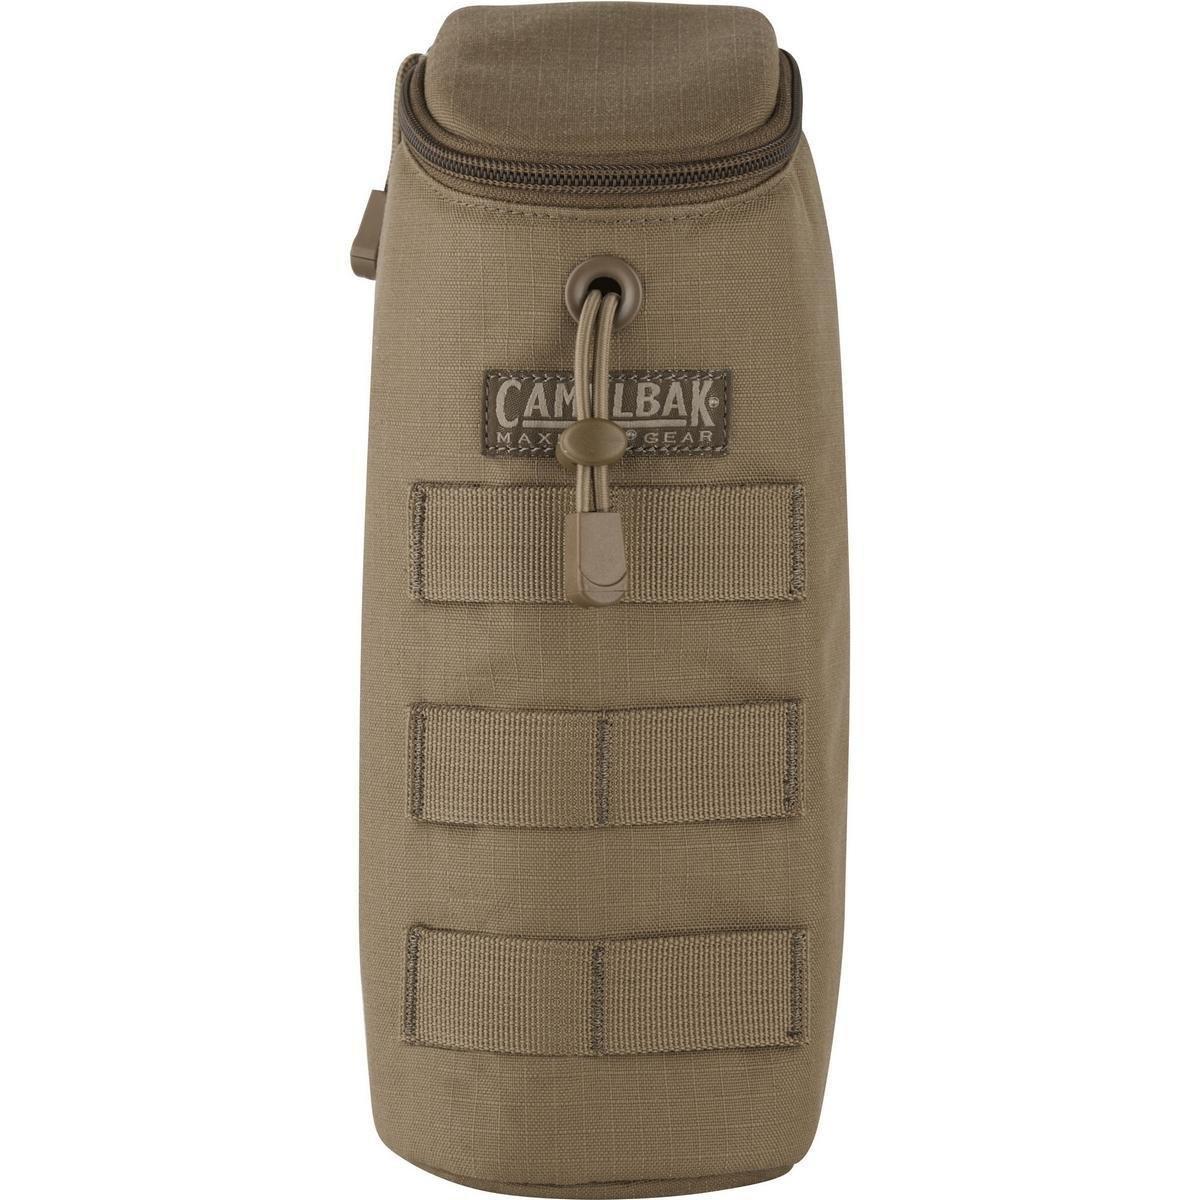 Compartimento Térmico Camelbak Max Gear Bottle Pouch Coyote